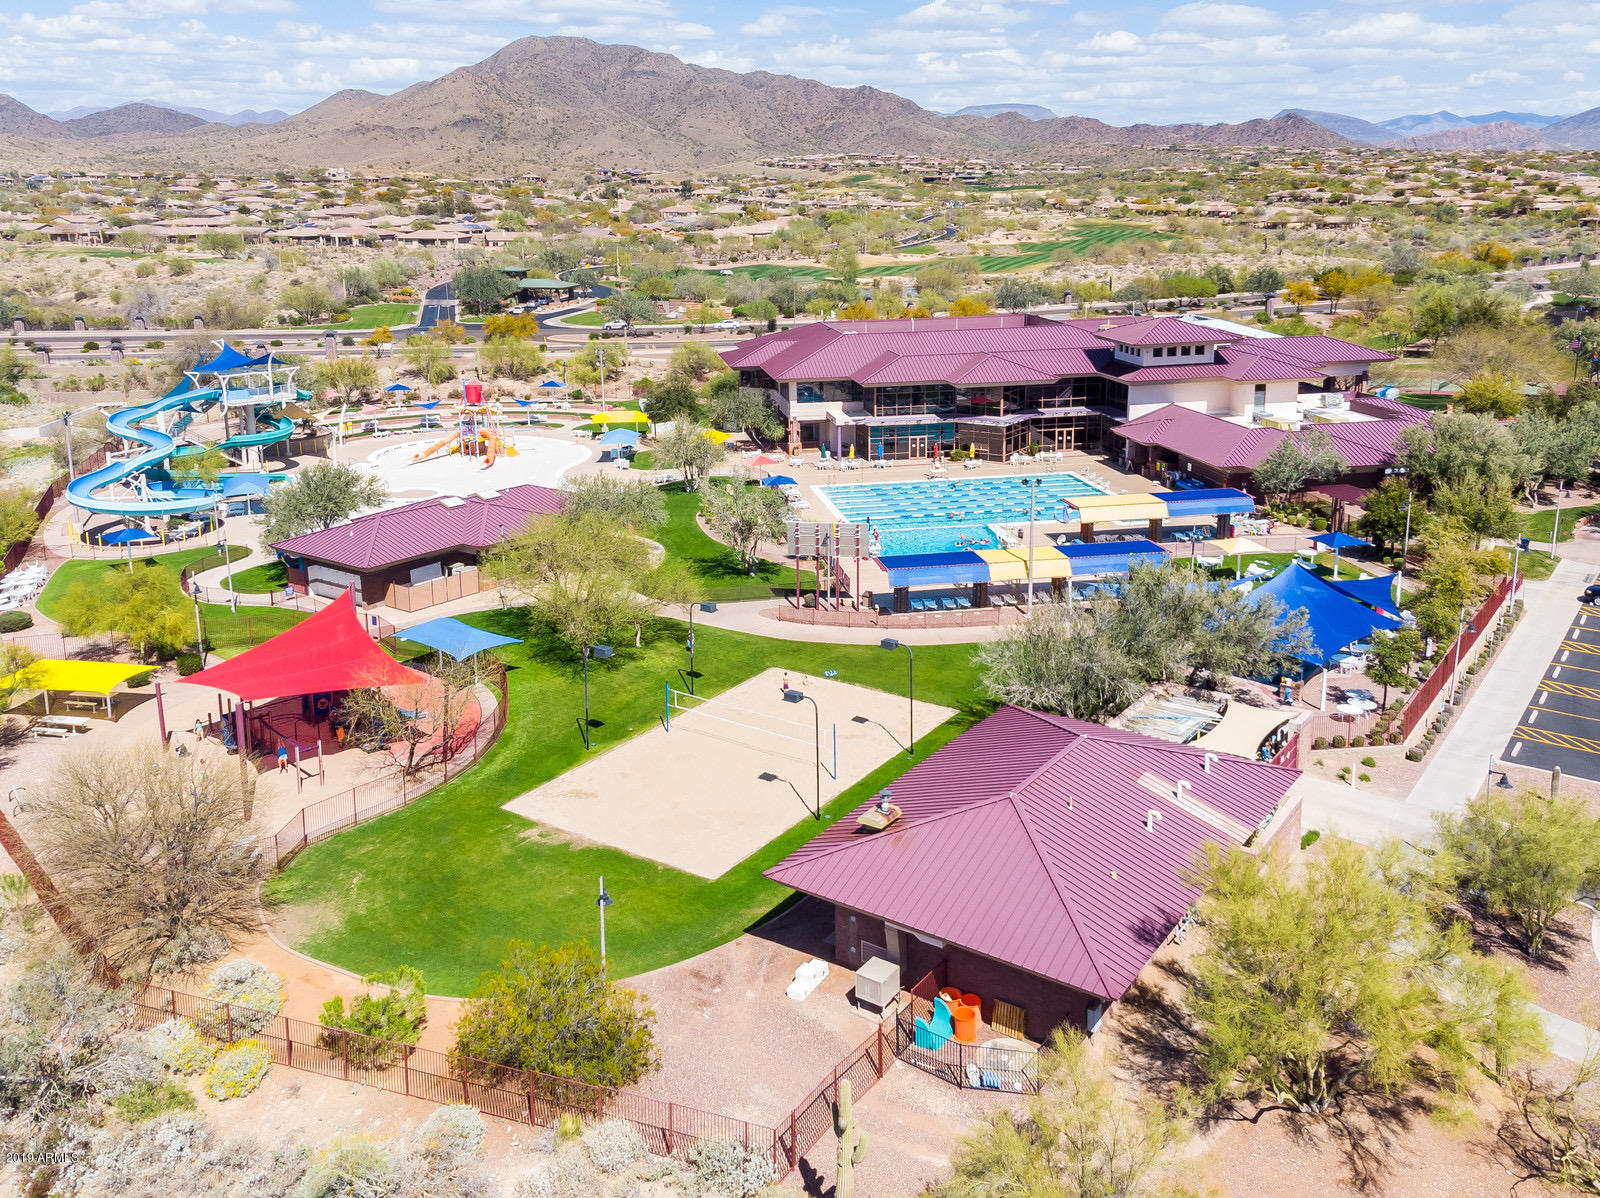 MLS 5971755 44524 N SONORAN ARROYO Lane, New River, AZ 85087 New River AZ Newly Built